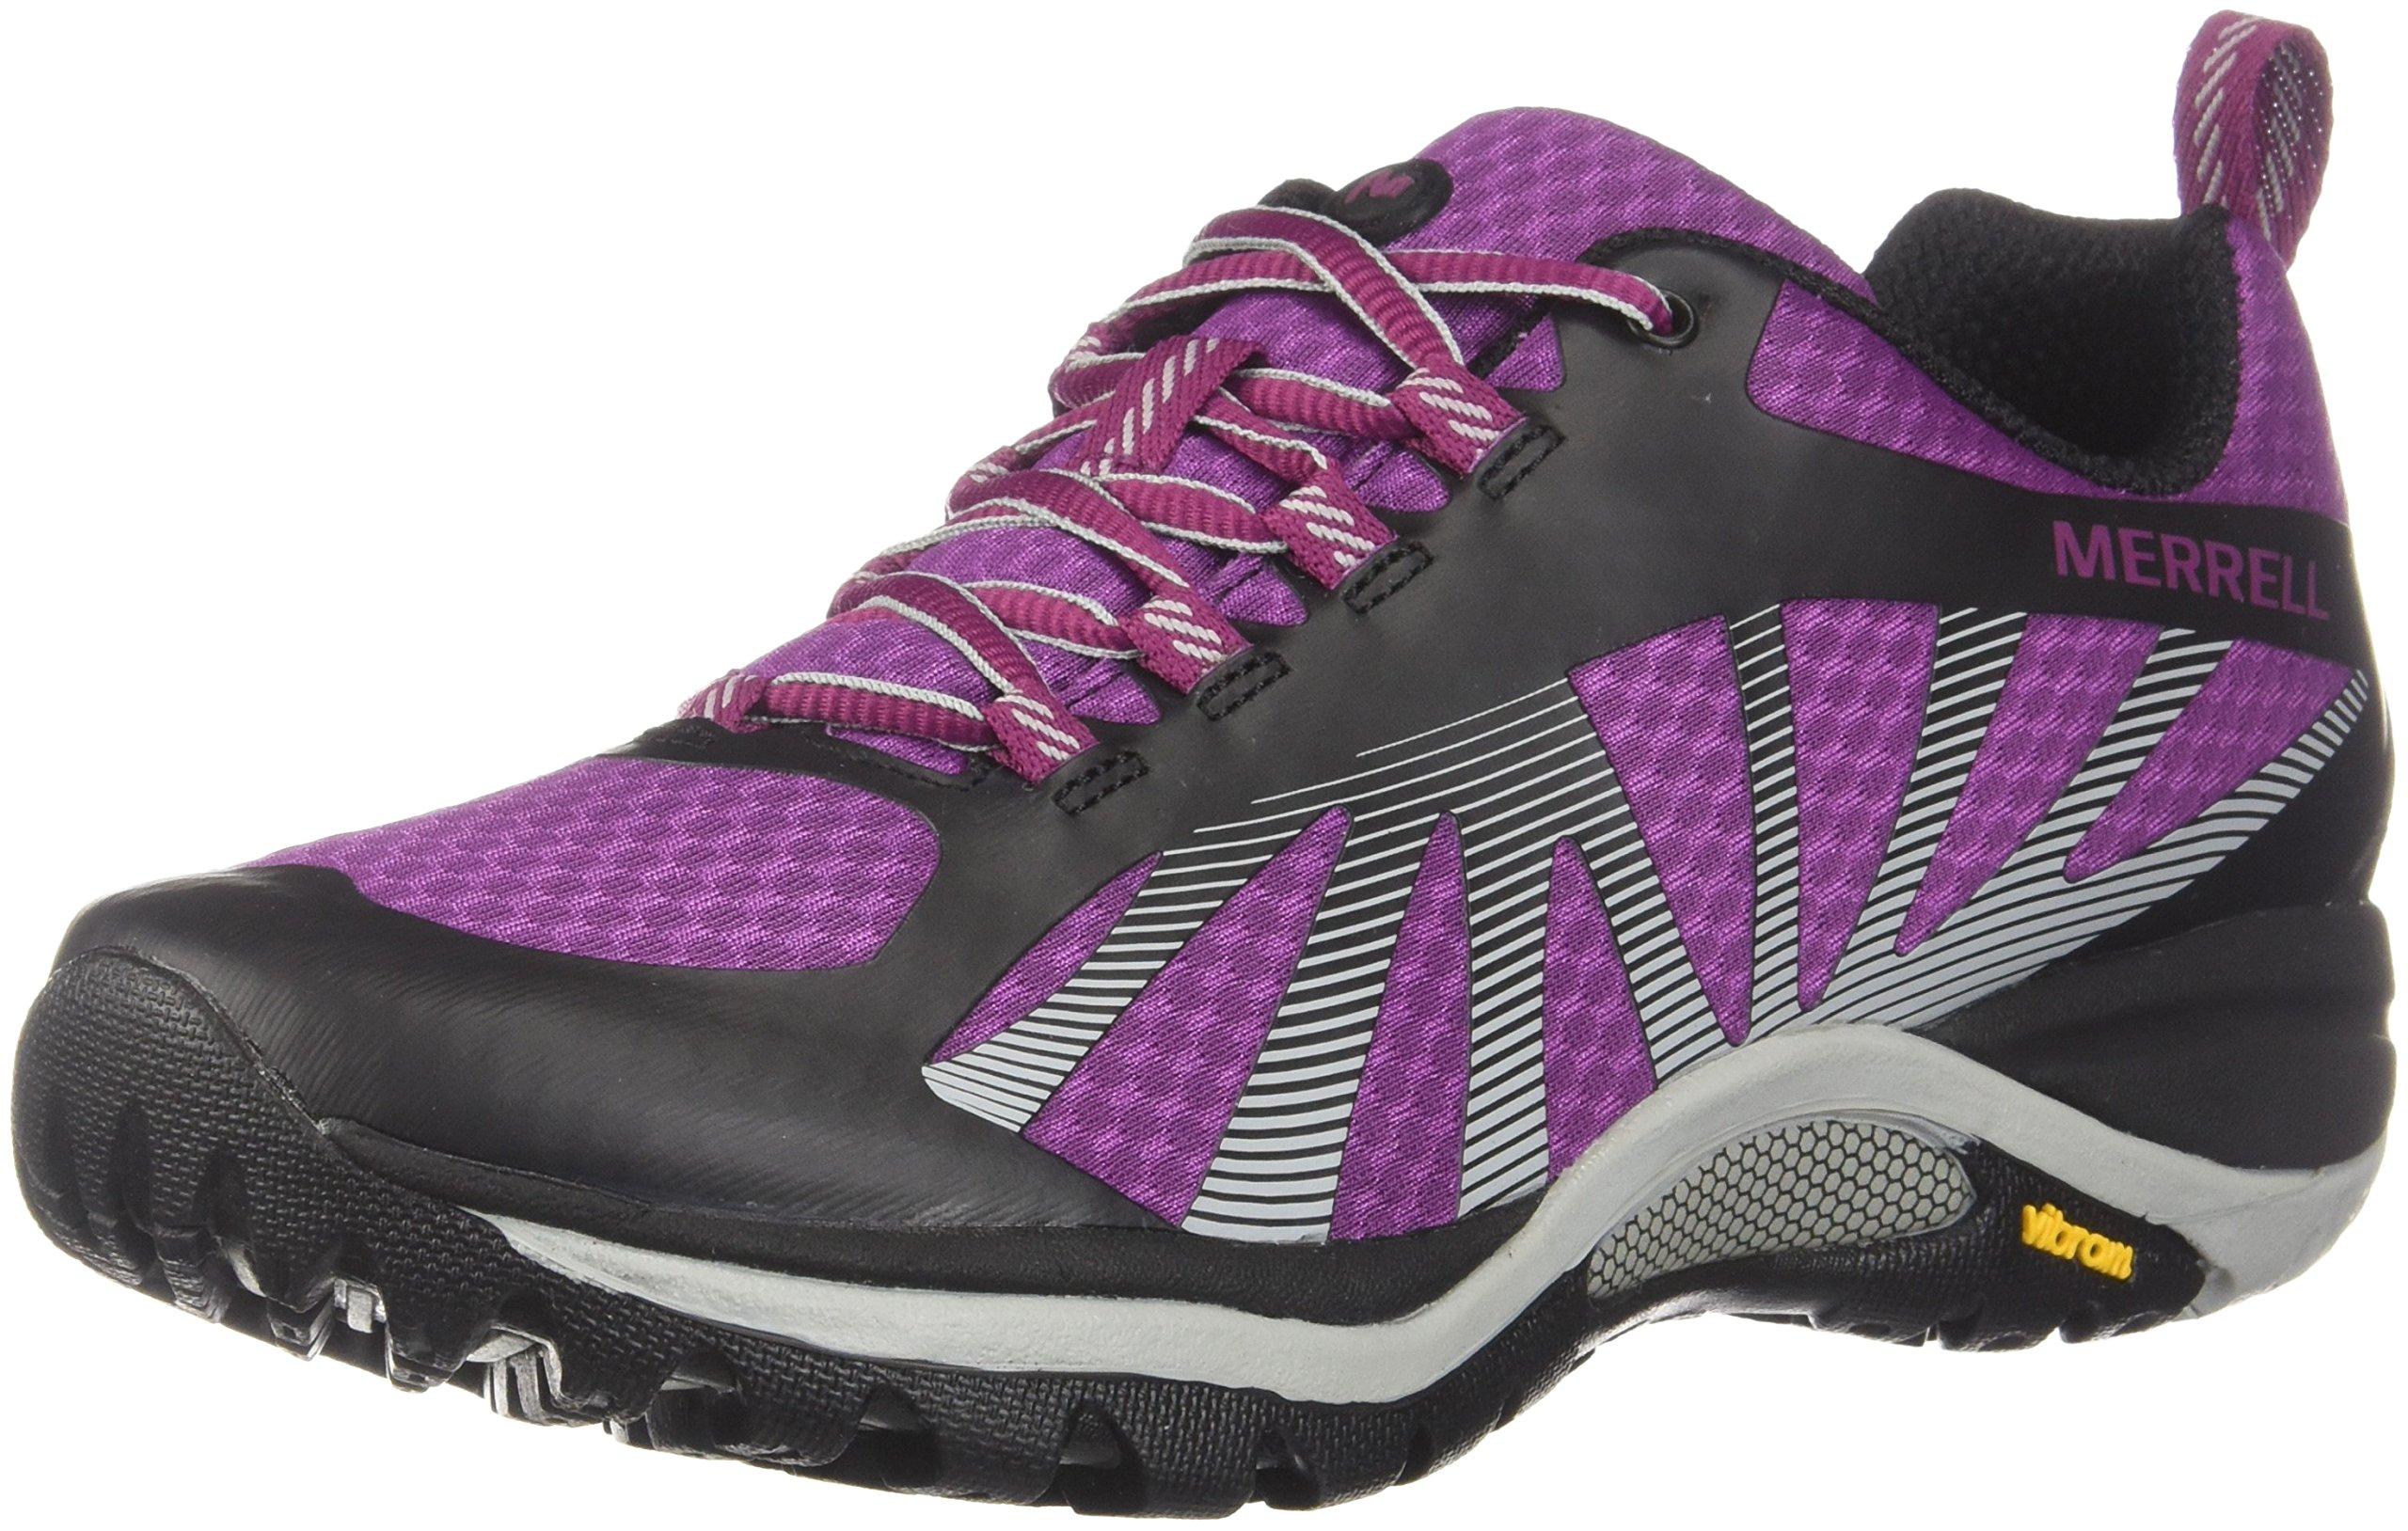 Merrell Women's Siren Edge Hiking Shoes, Amaranth, 6 Medium